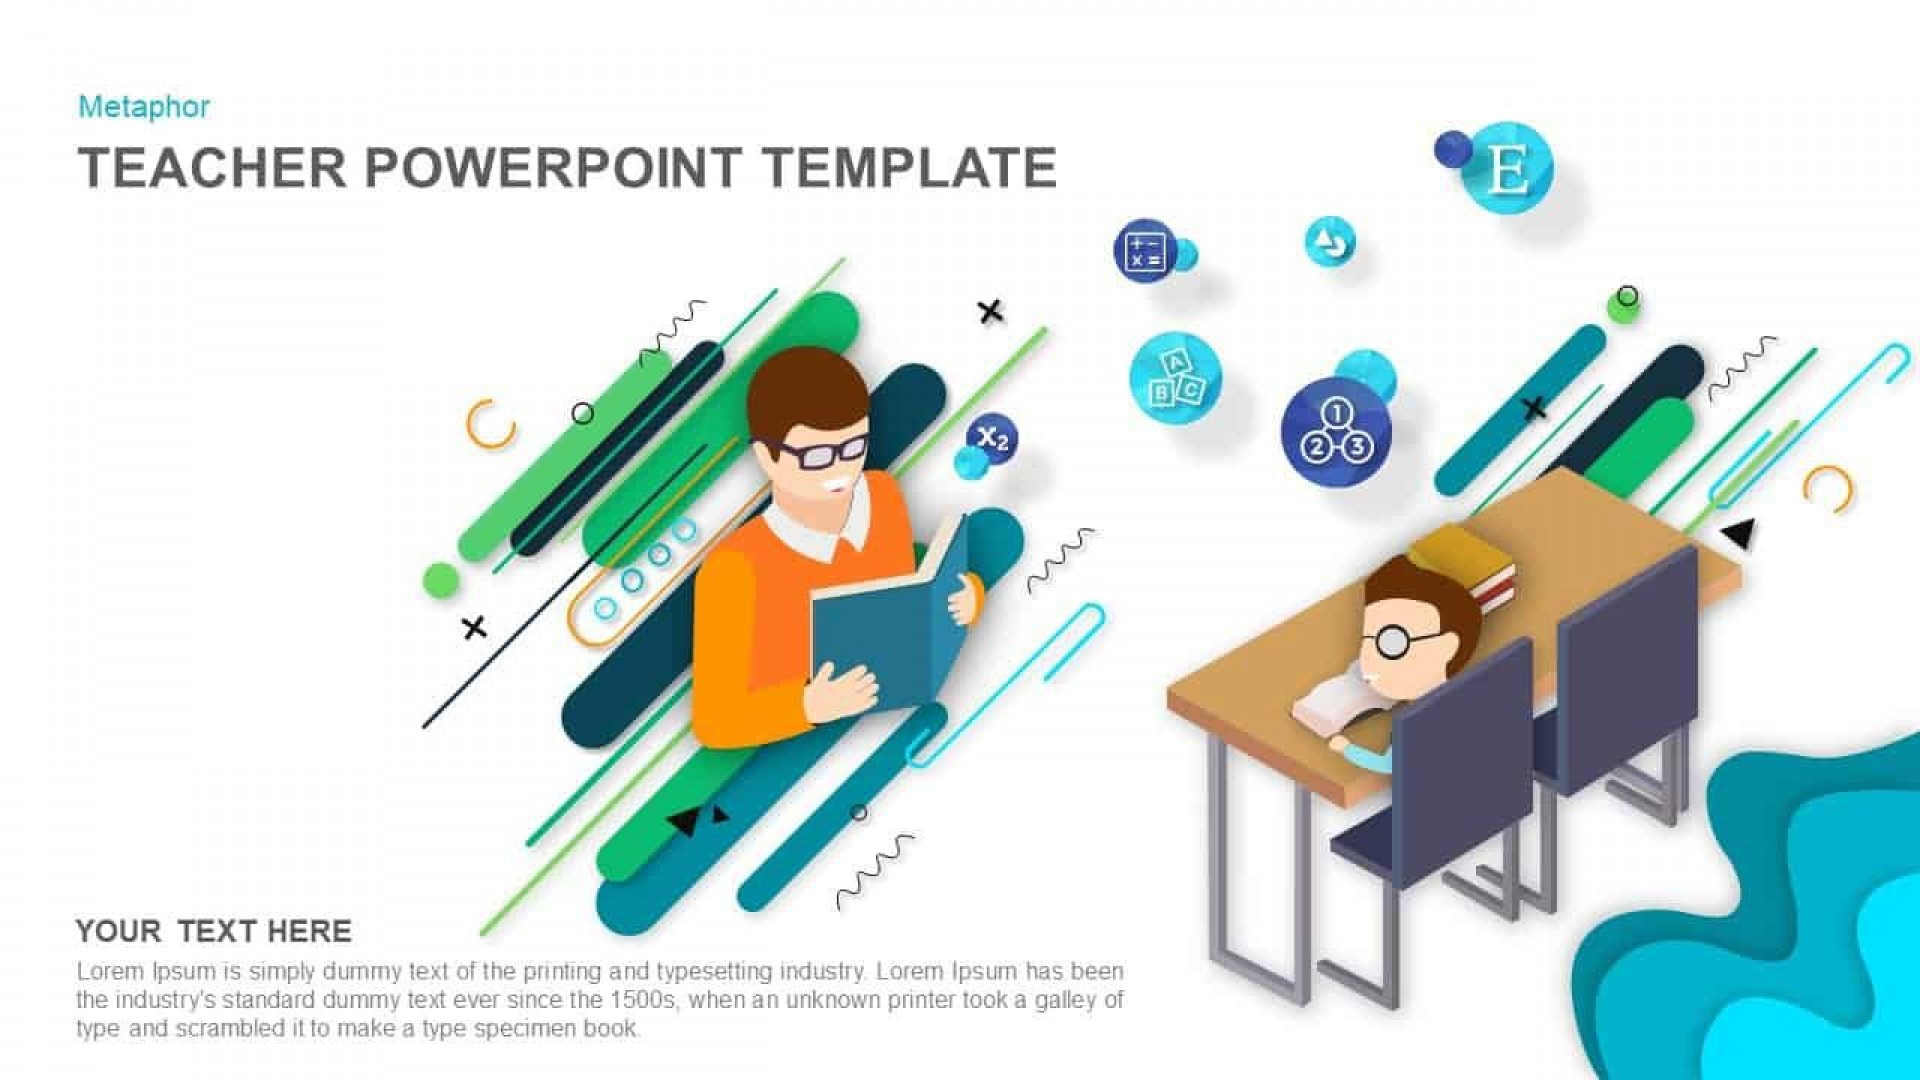 006 Unique Ppt Template For Teacher Example  Teachers Free Download Powerpoint Education Kindergarten1920